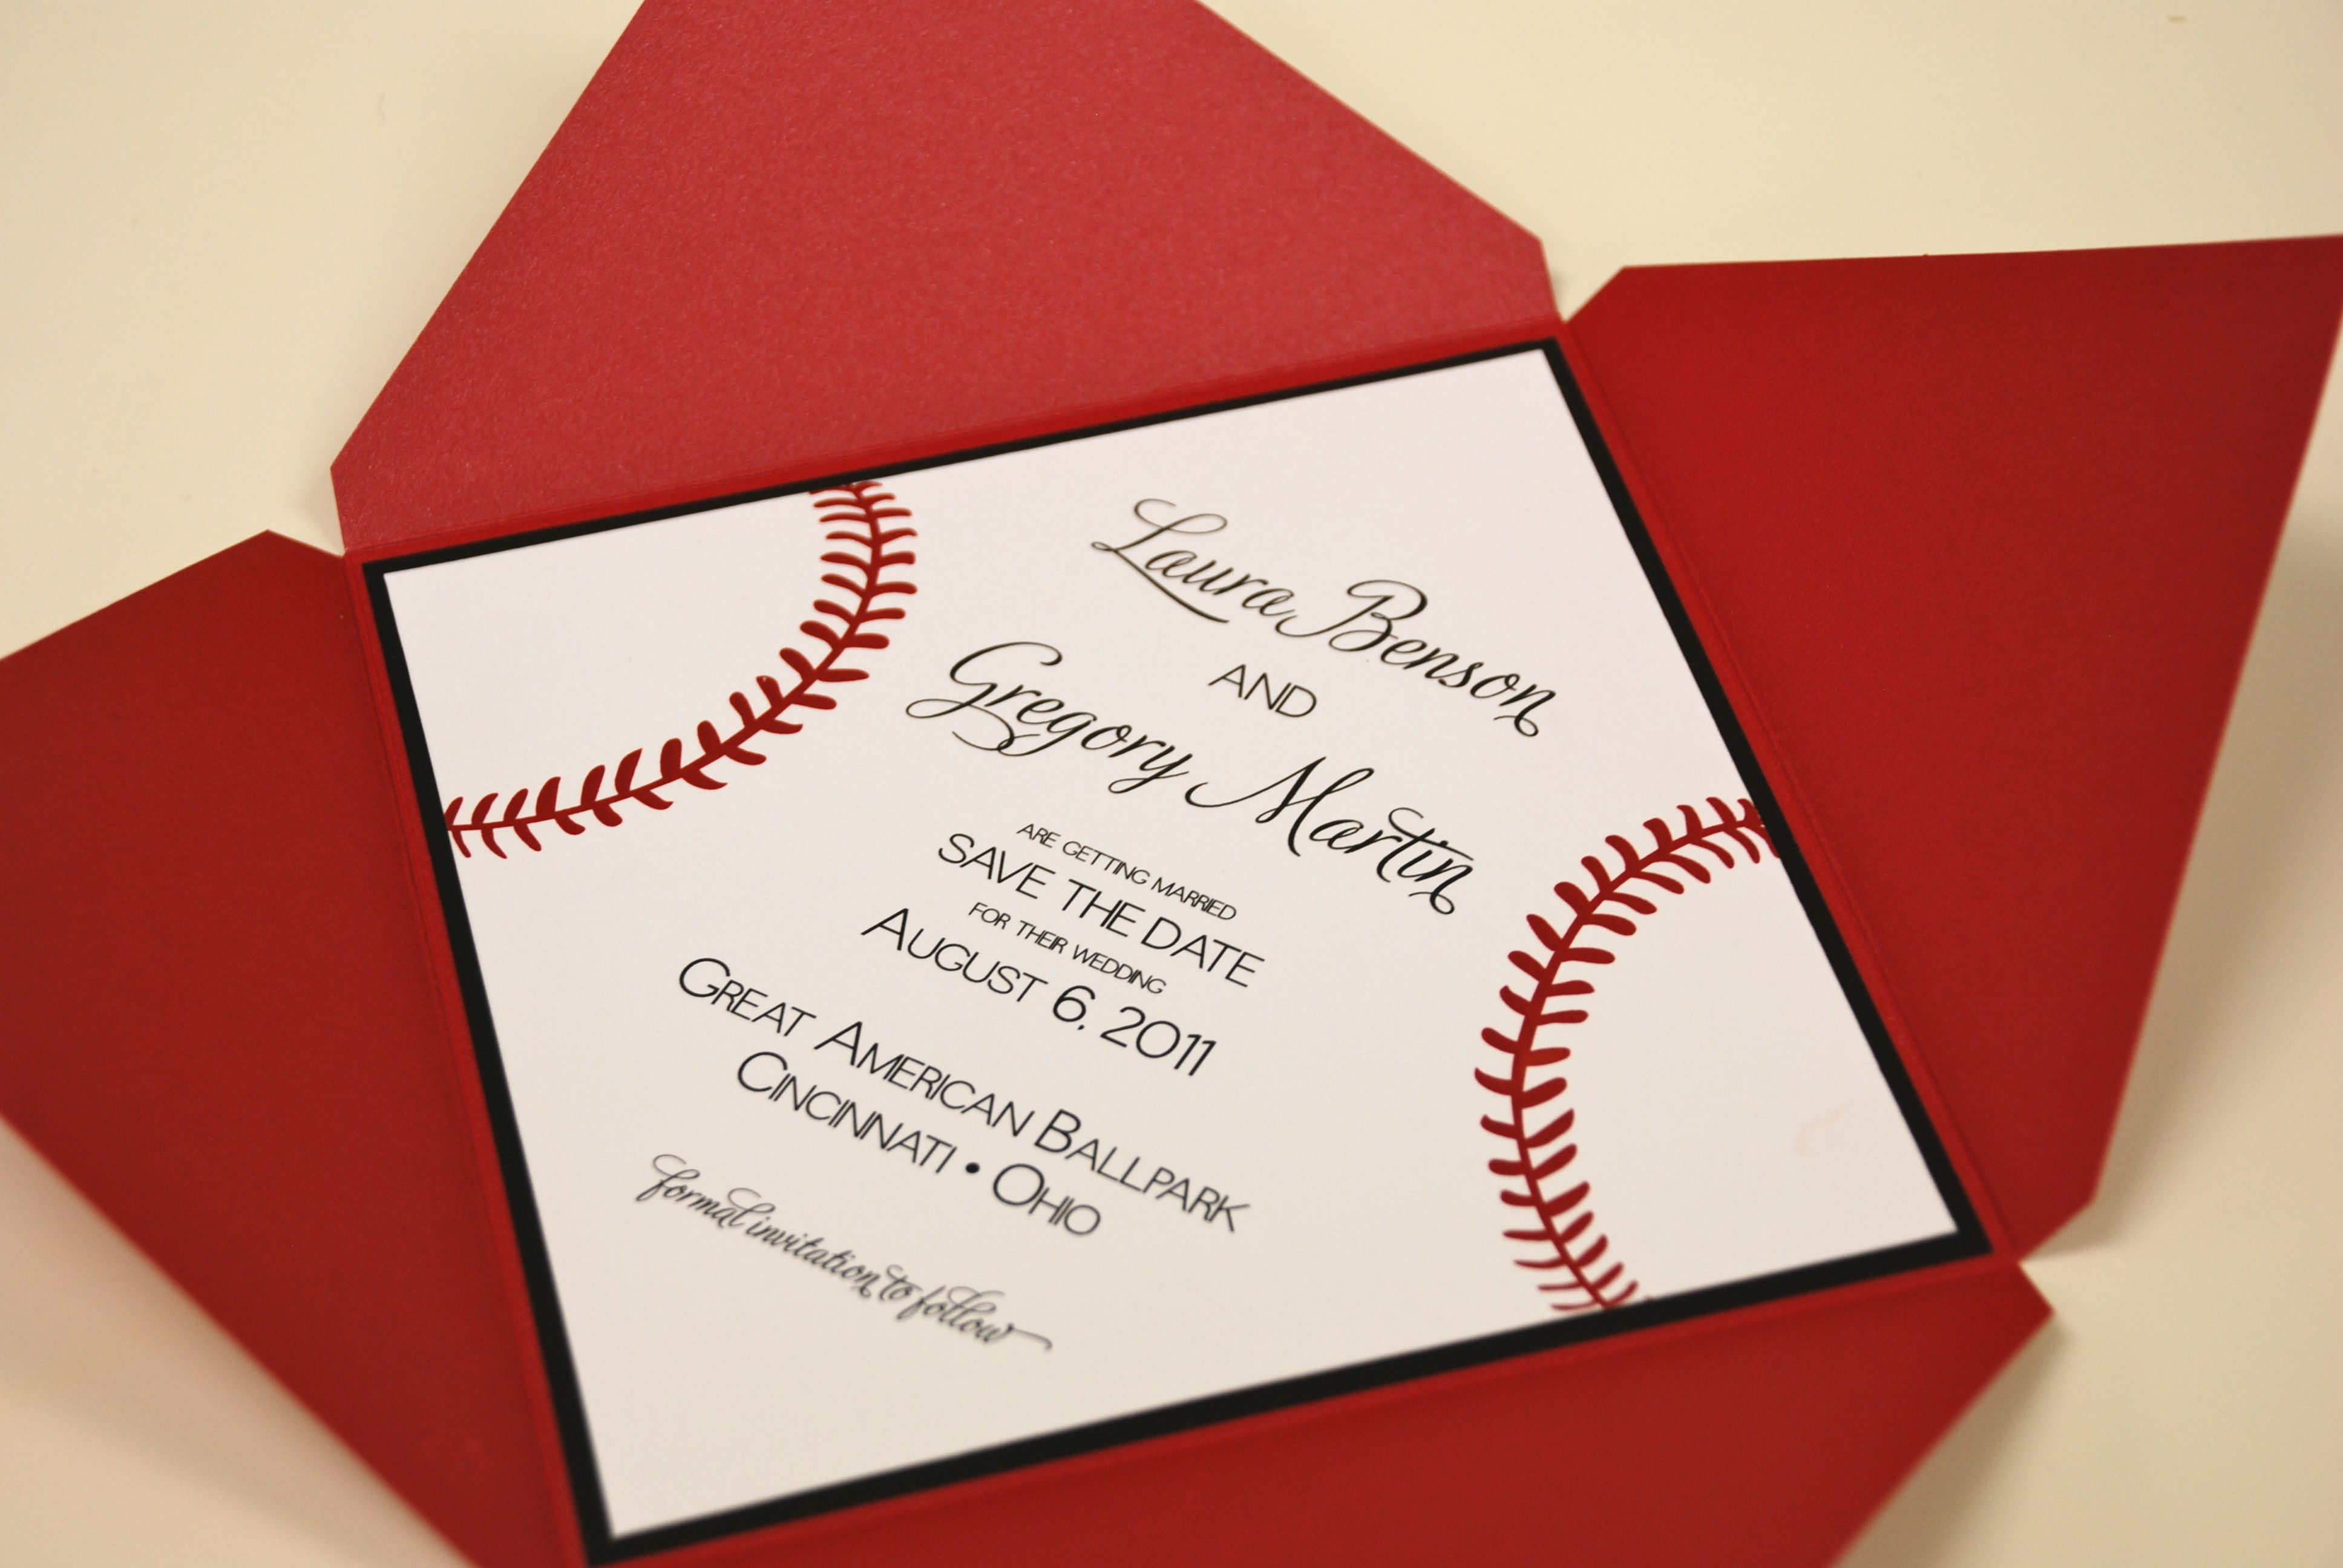 Great American Ballpark - Cincinnati Reds themed wedding invitation ...